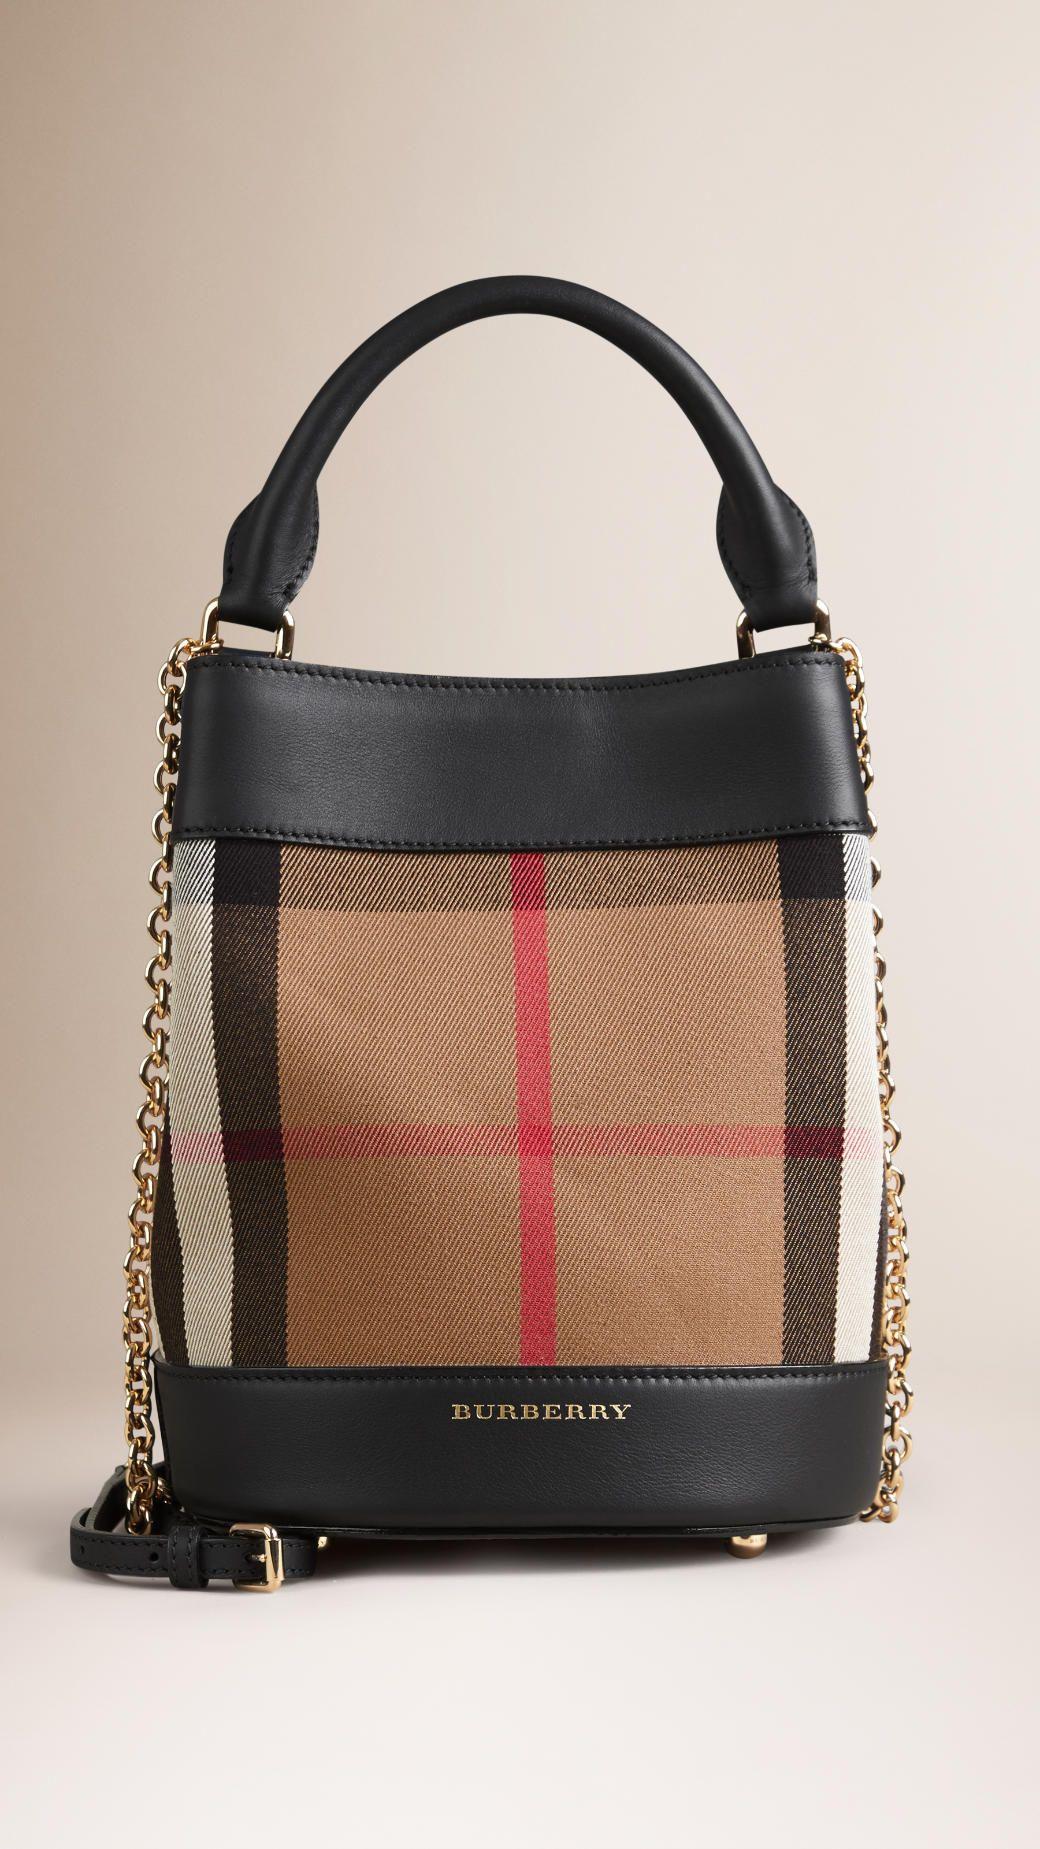 Petit sac Burberry Bucket avec motif Horseferry check et cuir Noir   Burberry